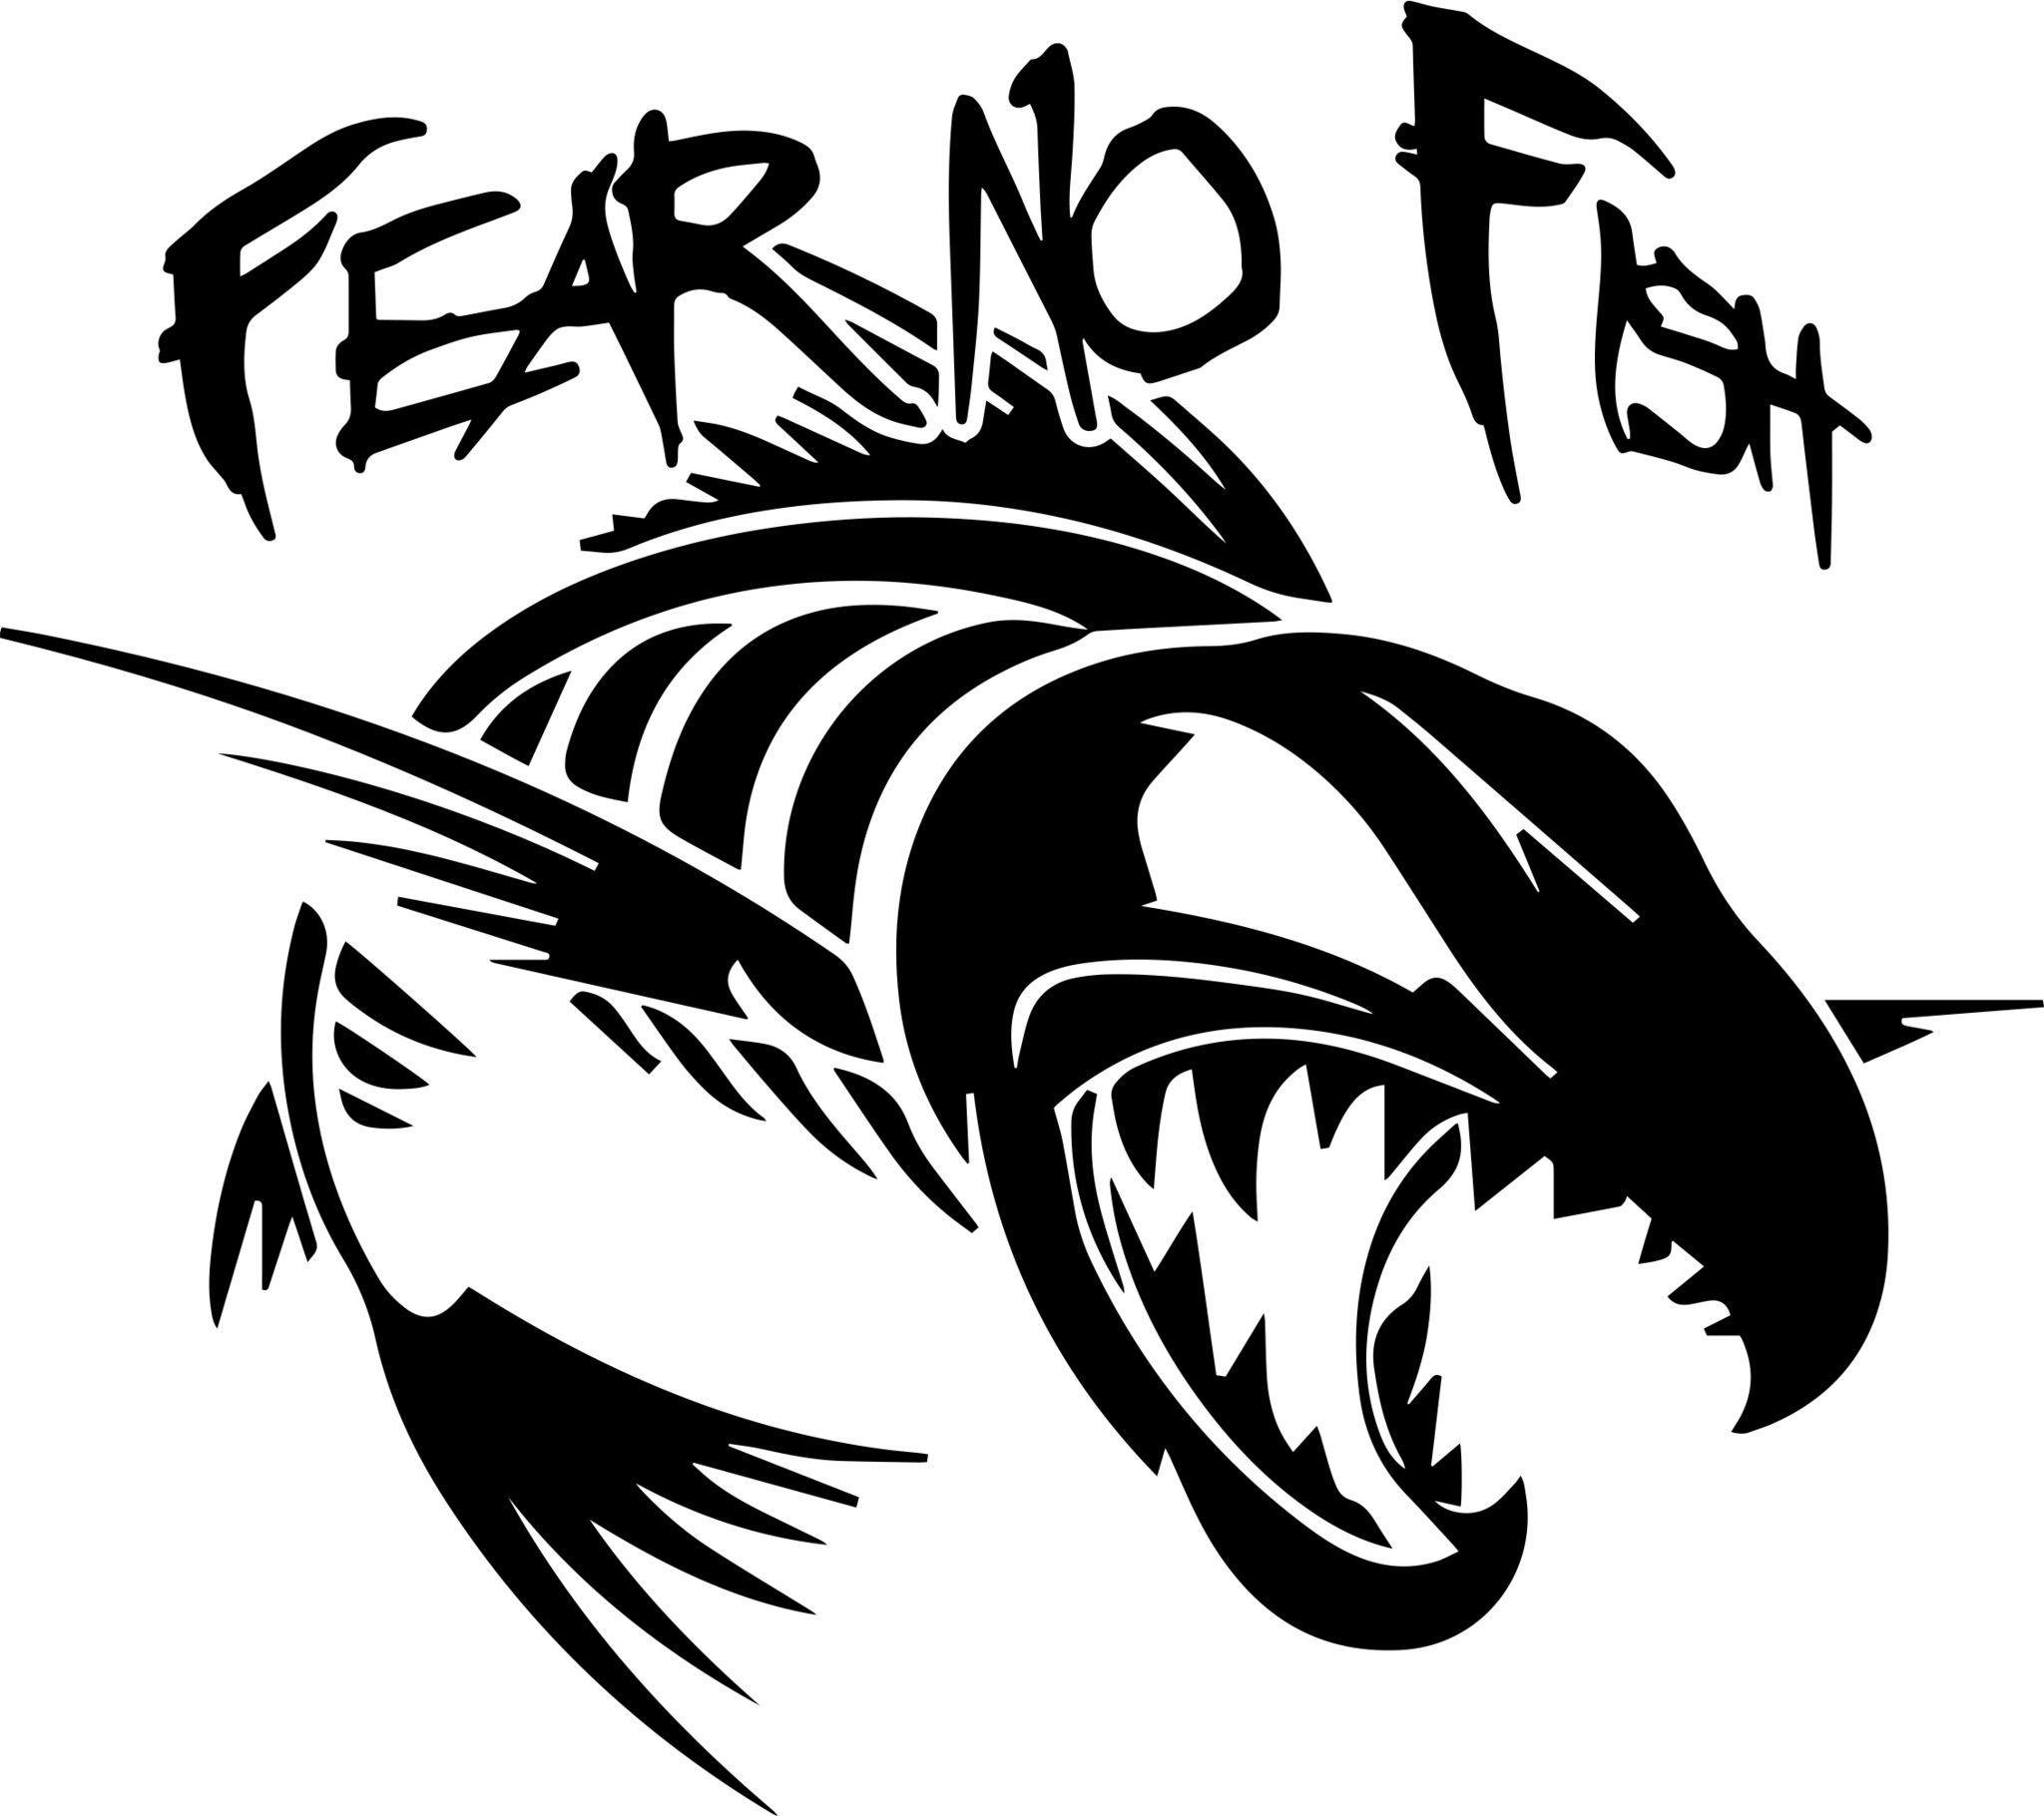 Fear No Fish Vinyl Sticker Bali Tattoos Dessin Poisson